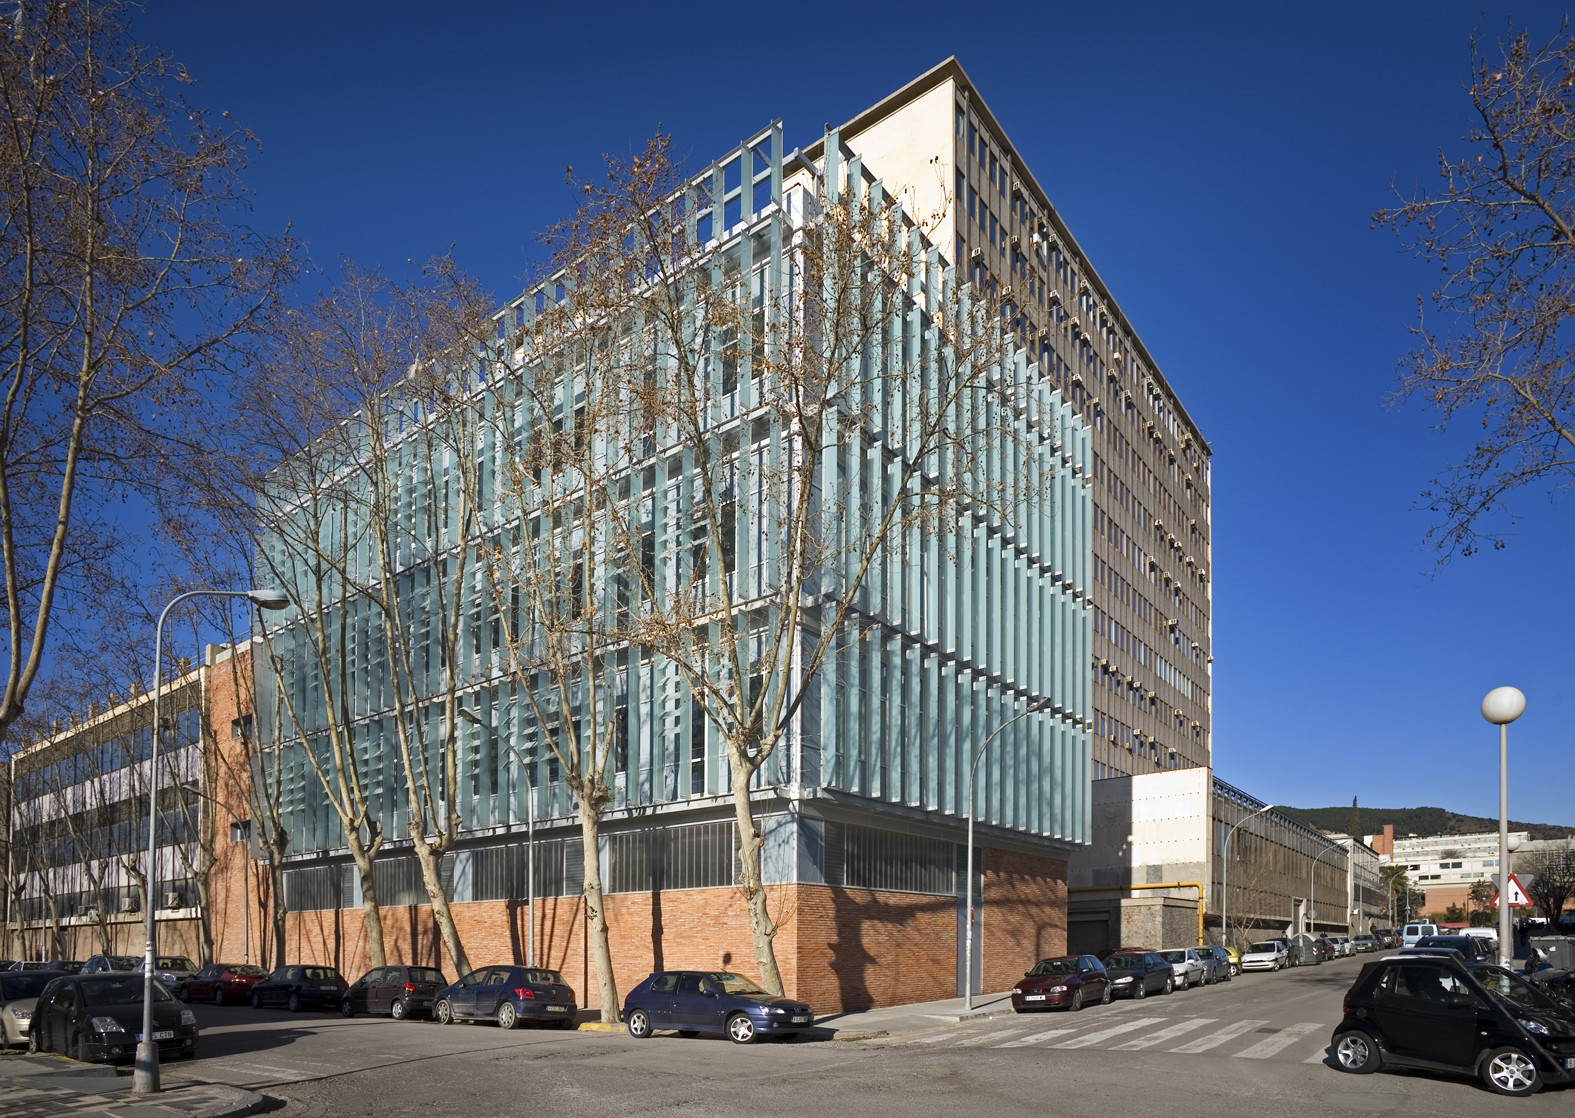 Etseib C' Departamental Building / Ravetllat Ribas Architects, © Roger Casas